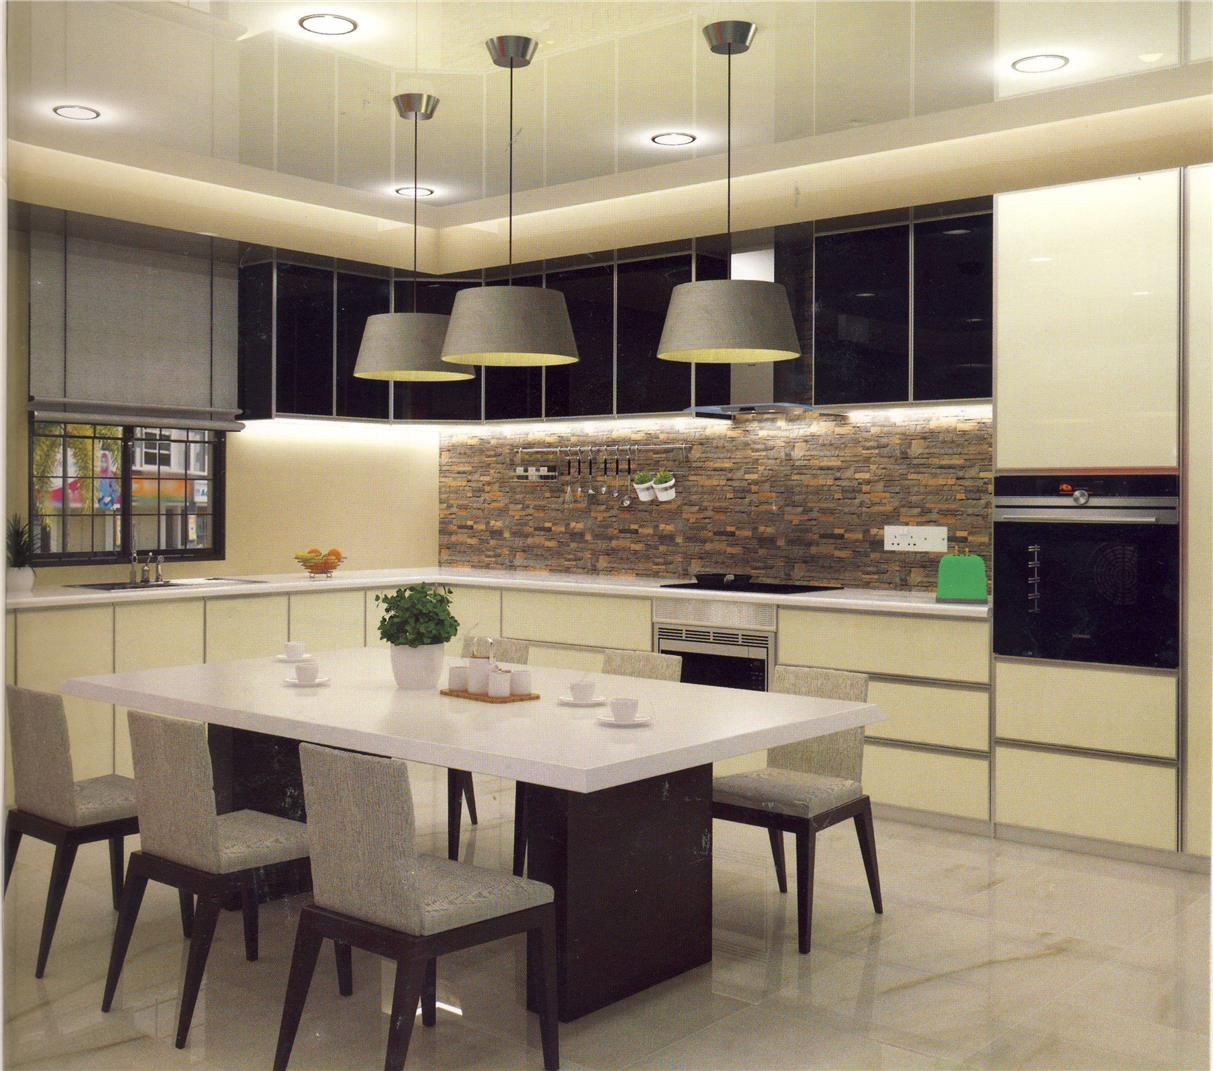 Kitchen Cabinet Selangor Kitchen Cabinet In Rawang: Kitchen Cabi (Selangor) End Time 3/28/2018 2:15 PM Lelong.my